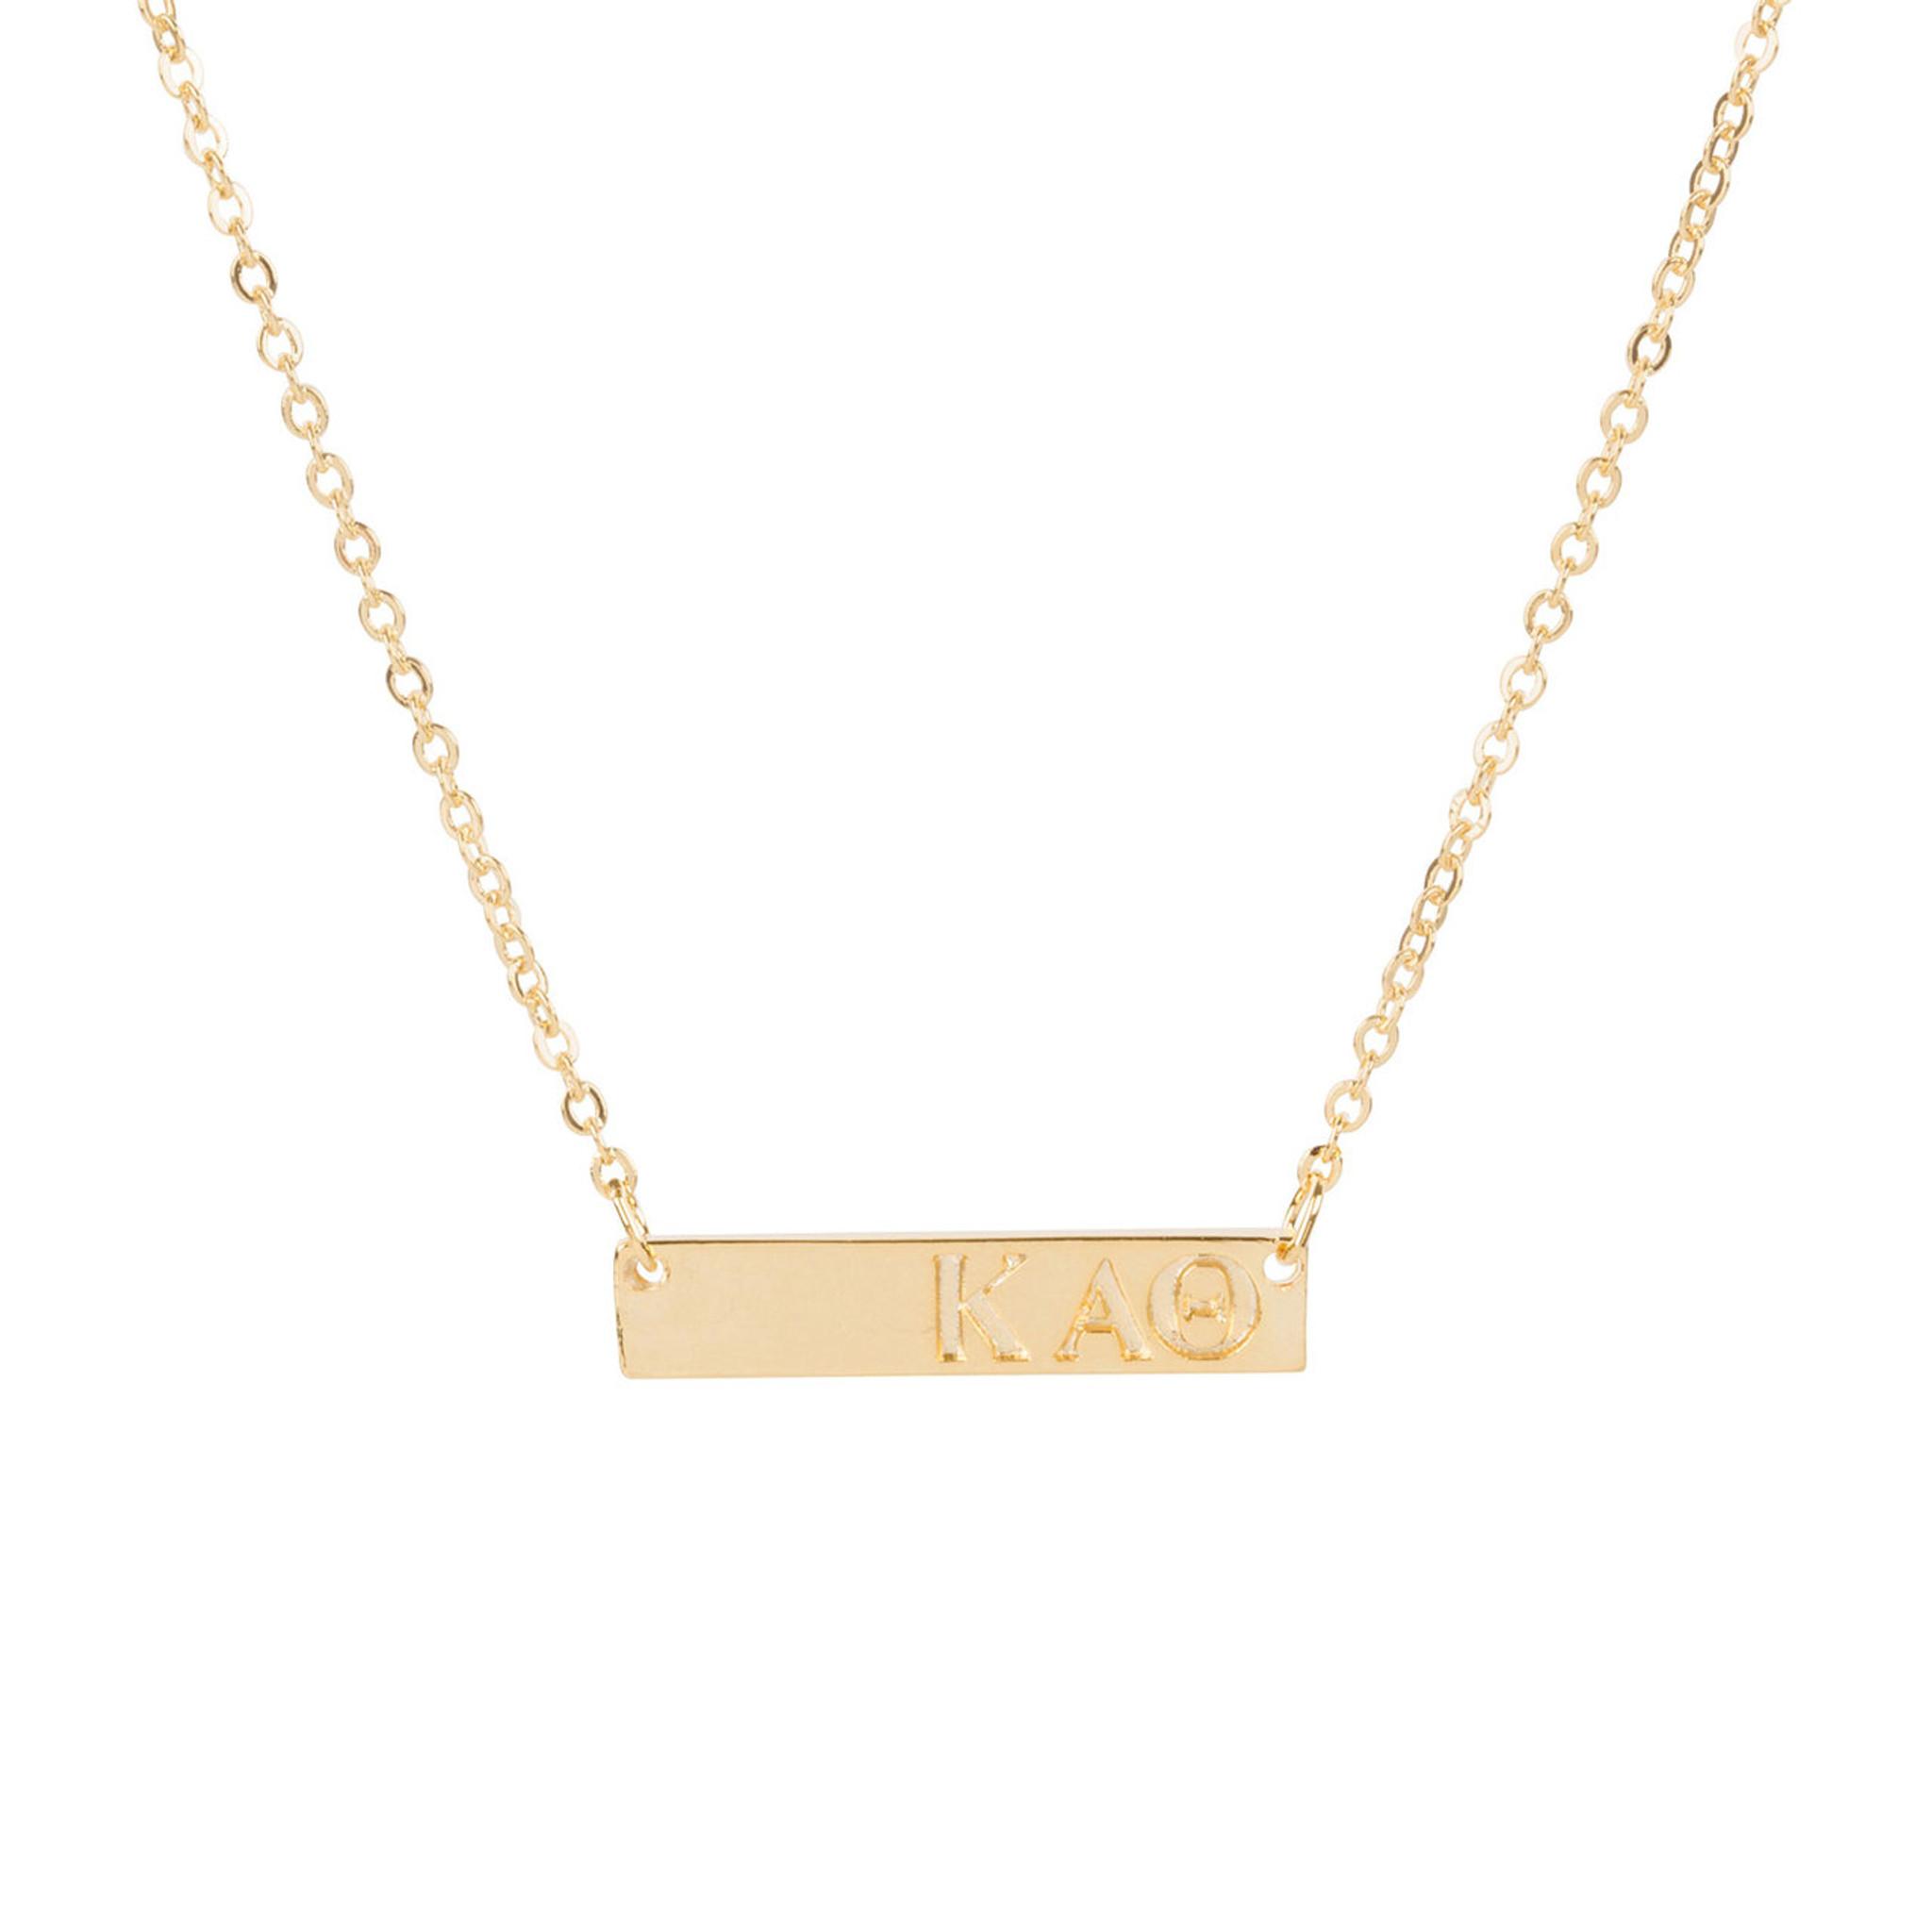 Kappa Alpha Theta Gold Bar Necklace